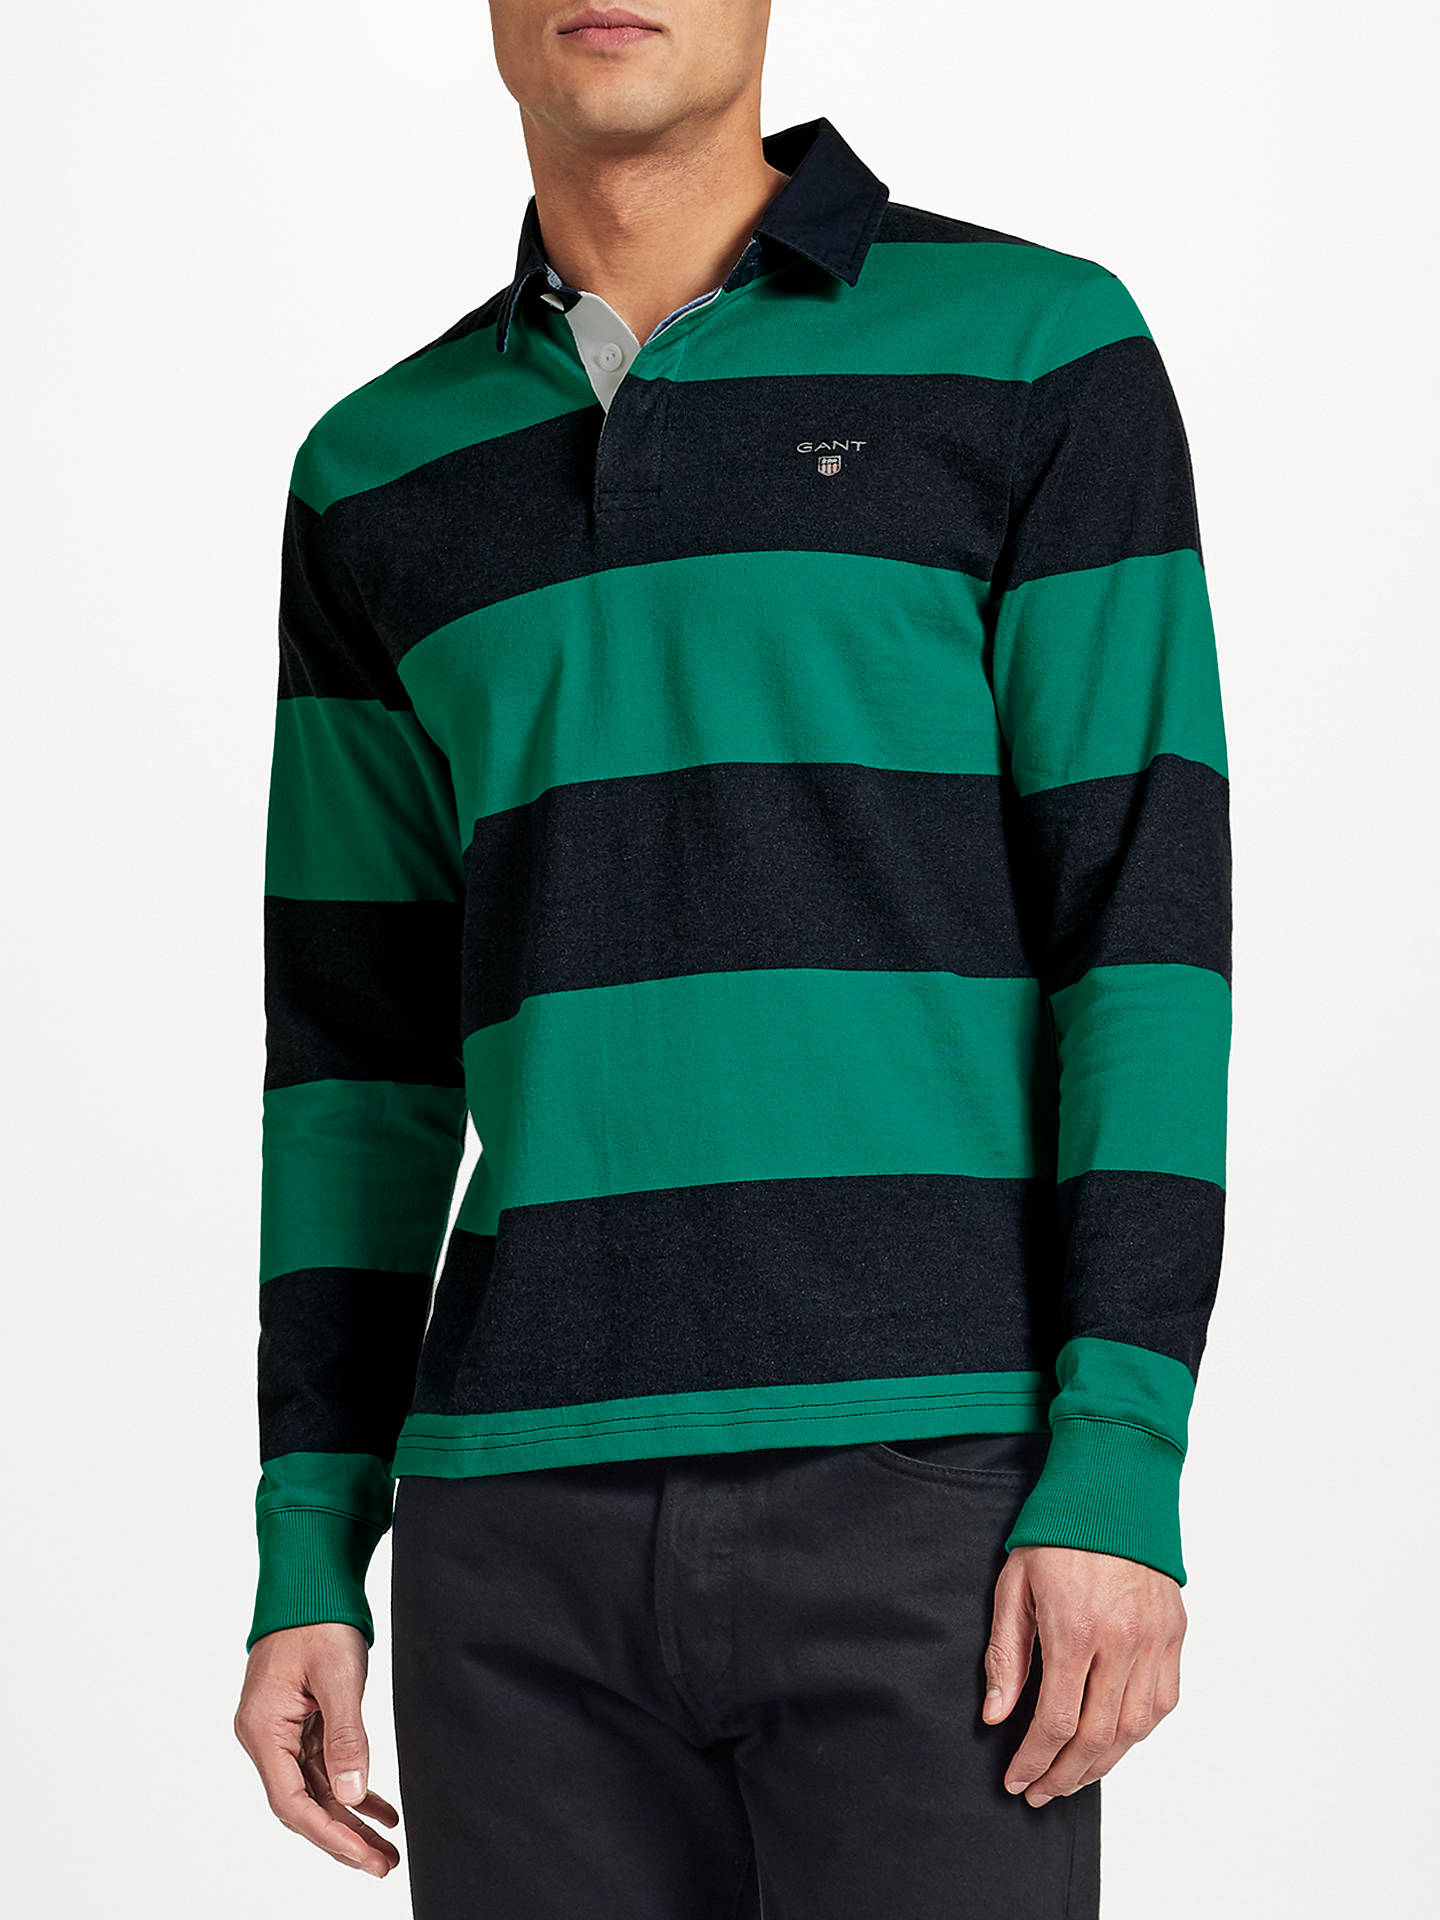 0b69336aa8 Buy GANT Rugger Bar Stripe Heavy Jersey Rugby Shirt, Emerald Green, M  Online at ...